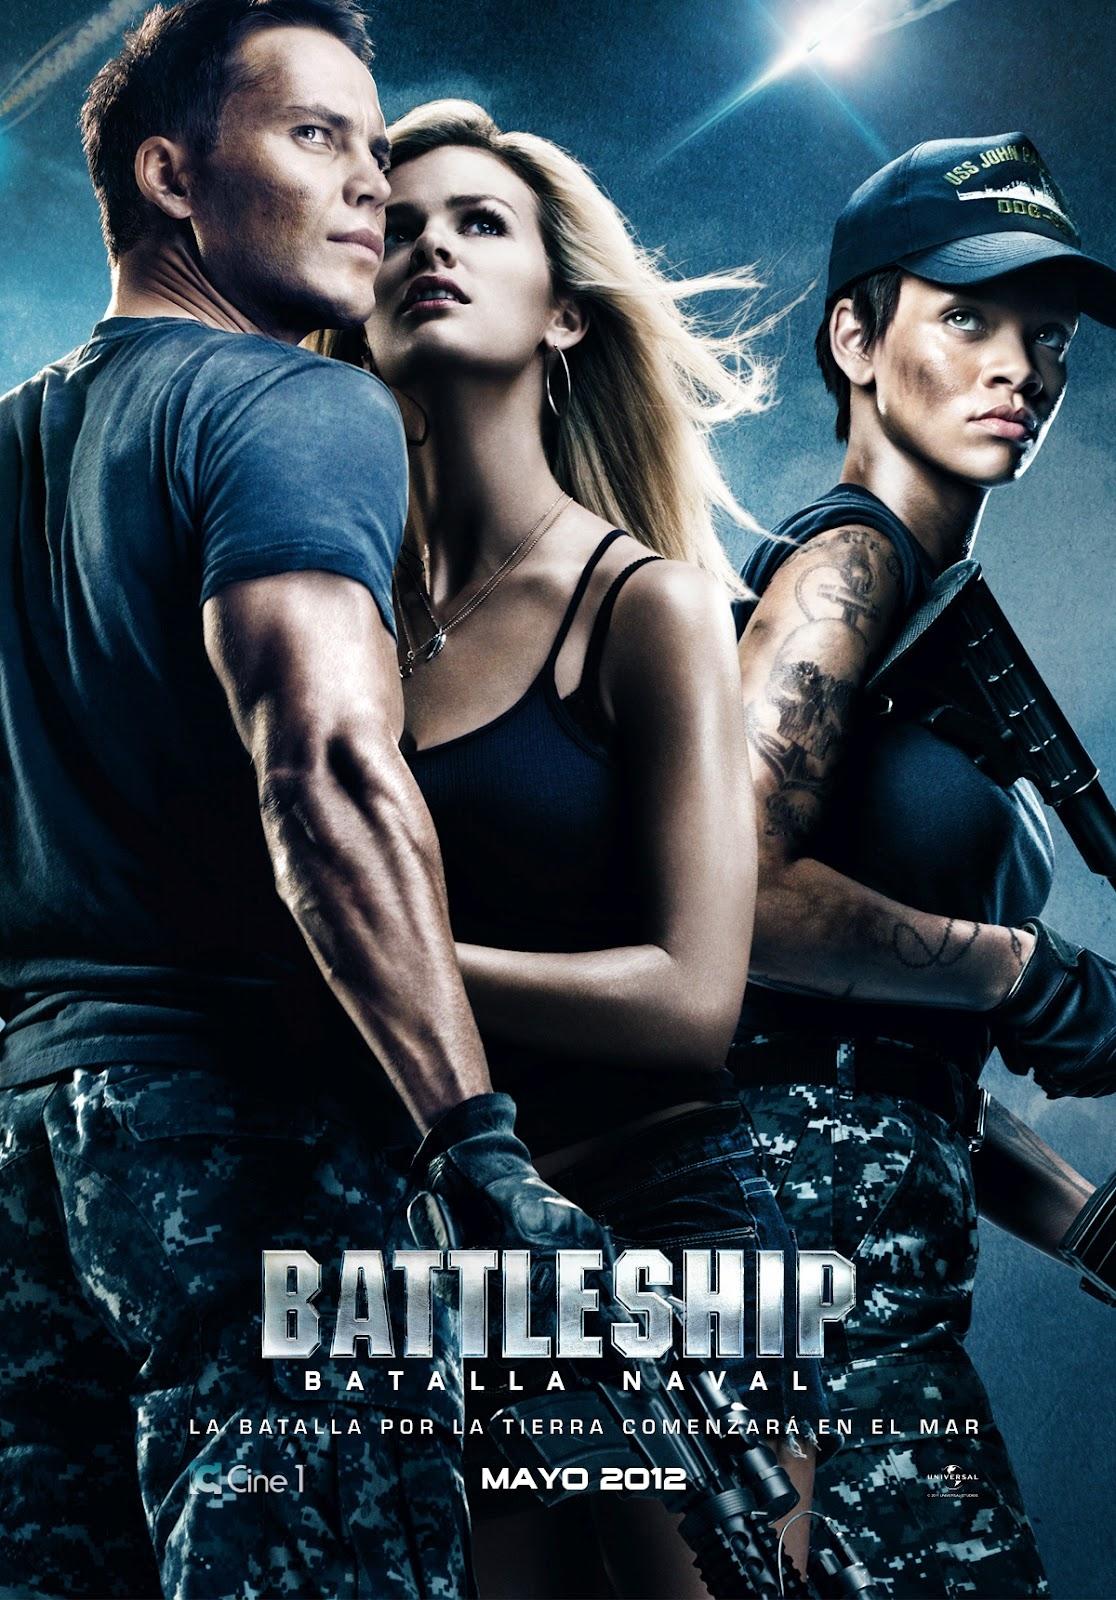 http://2.bp.blogspot.com/-95CbsaRSiCM/T3Seomz9OkI/AAAAAAAABC4/quMHPzrKClQ/s1600/Battleship+Latest+Poster+(1).jpg